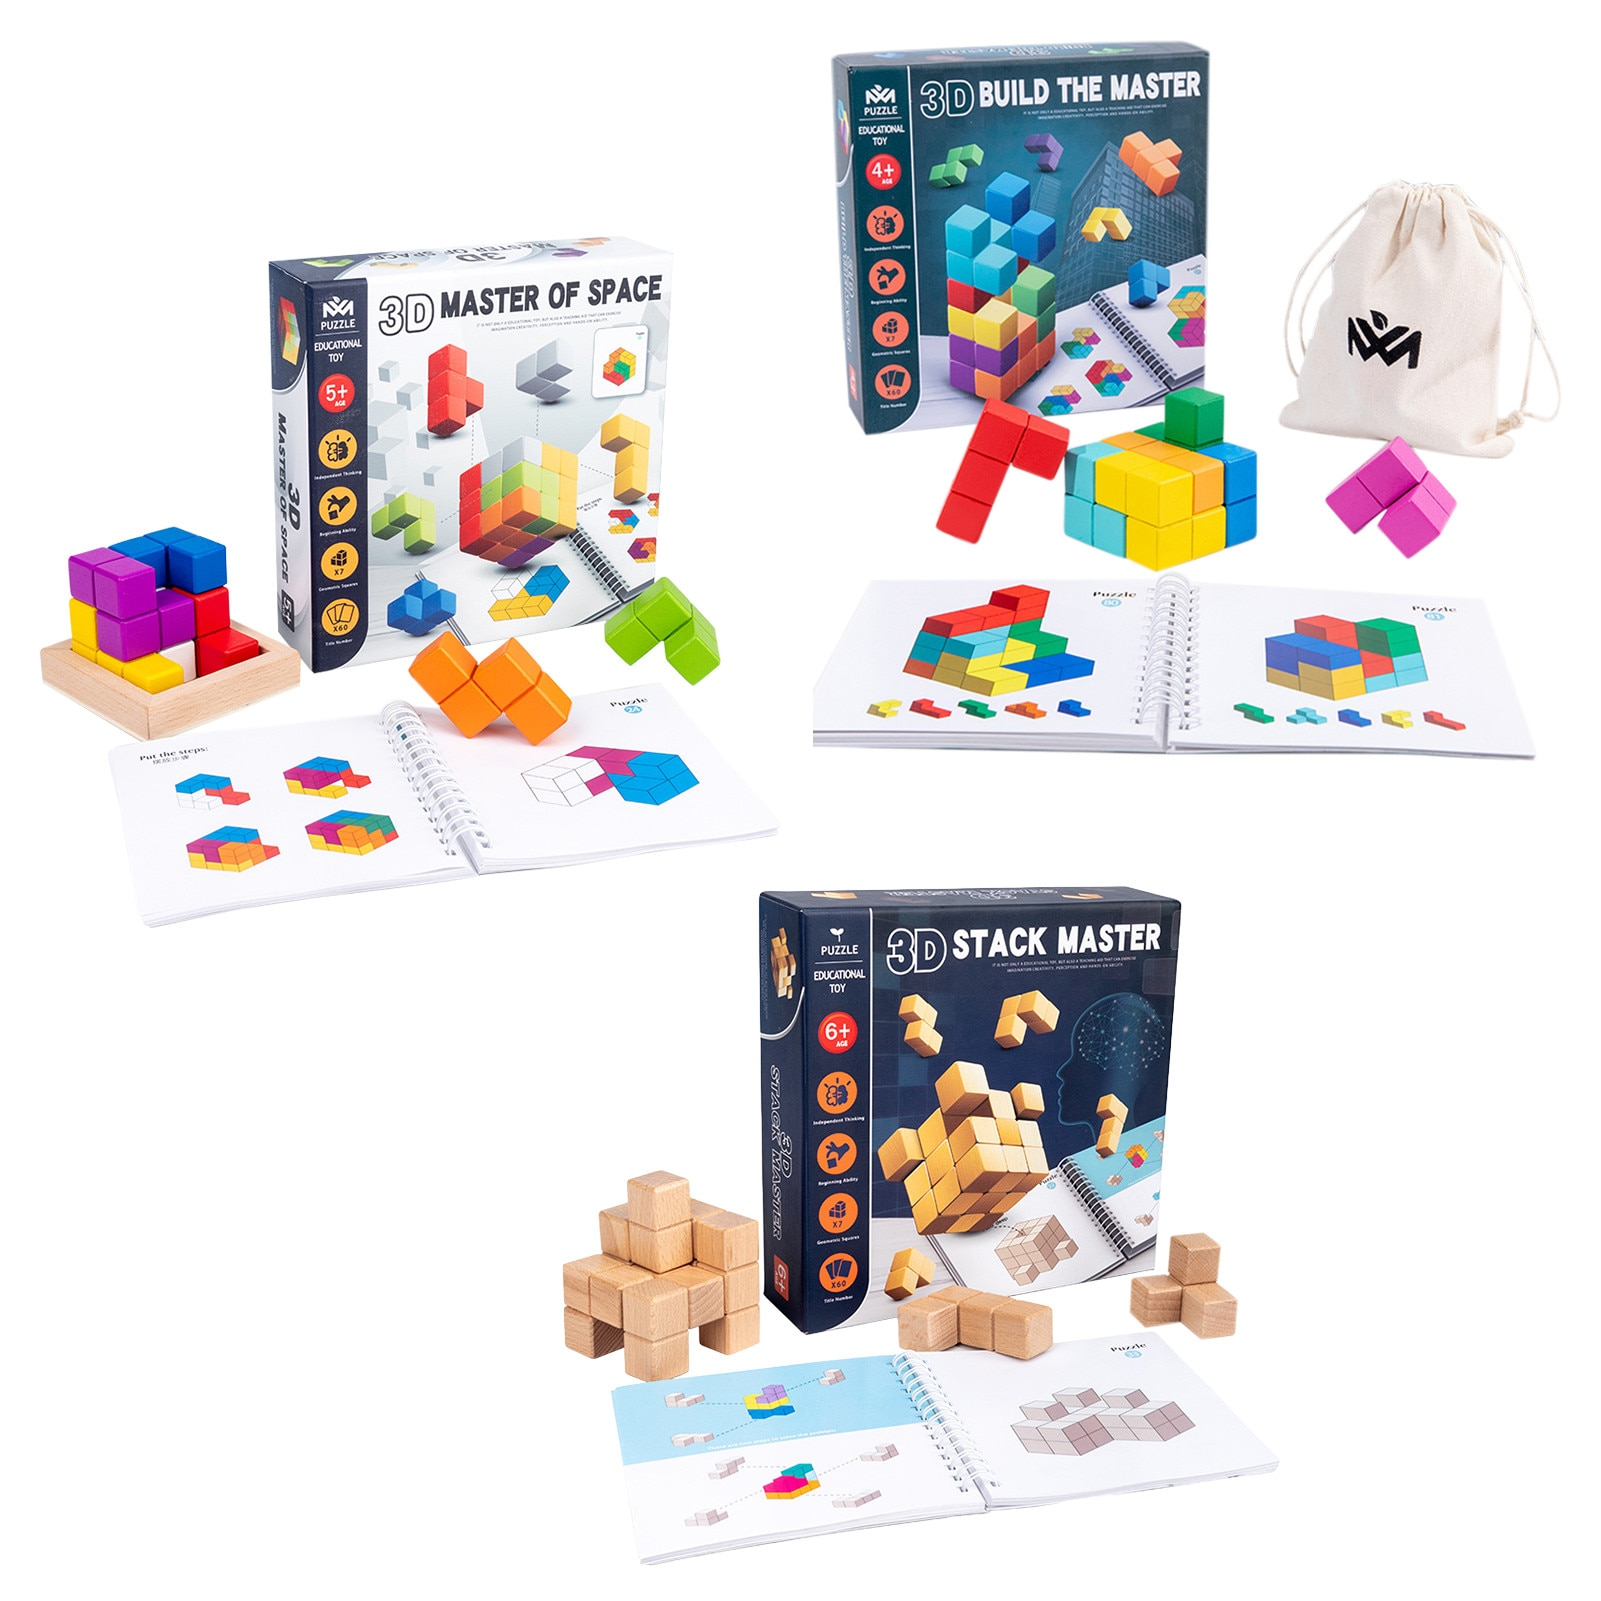 criancas tetristoys 3d rubikscuscube brinquedos educativos luban soma logica espacial